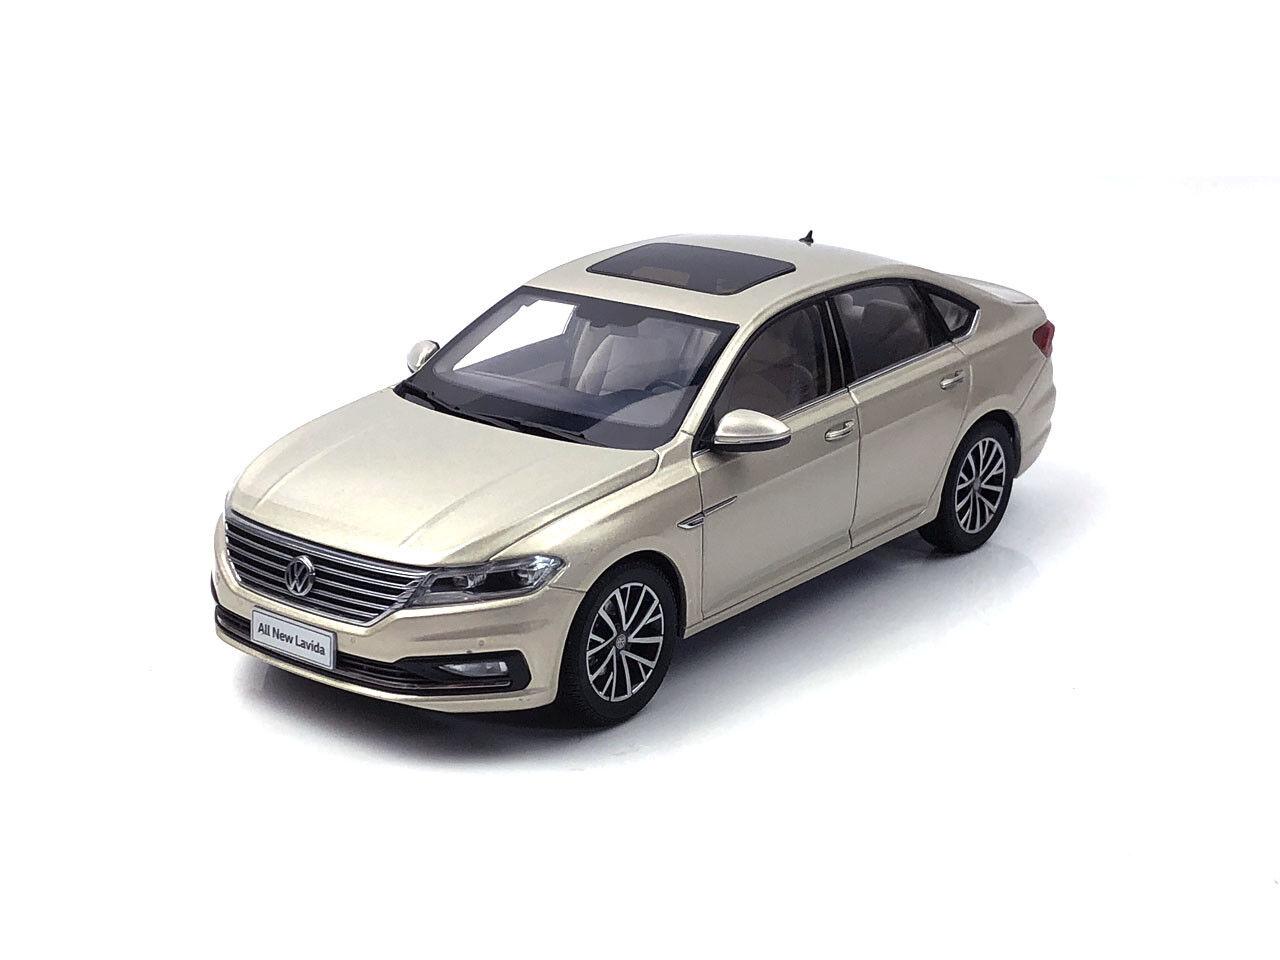 1 18 Volkswagen  All nouveau Lavida 2018 or Diecast Metal Model voiture  magasin vente sortie